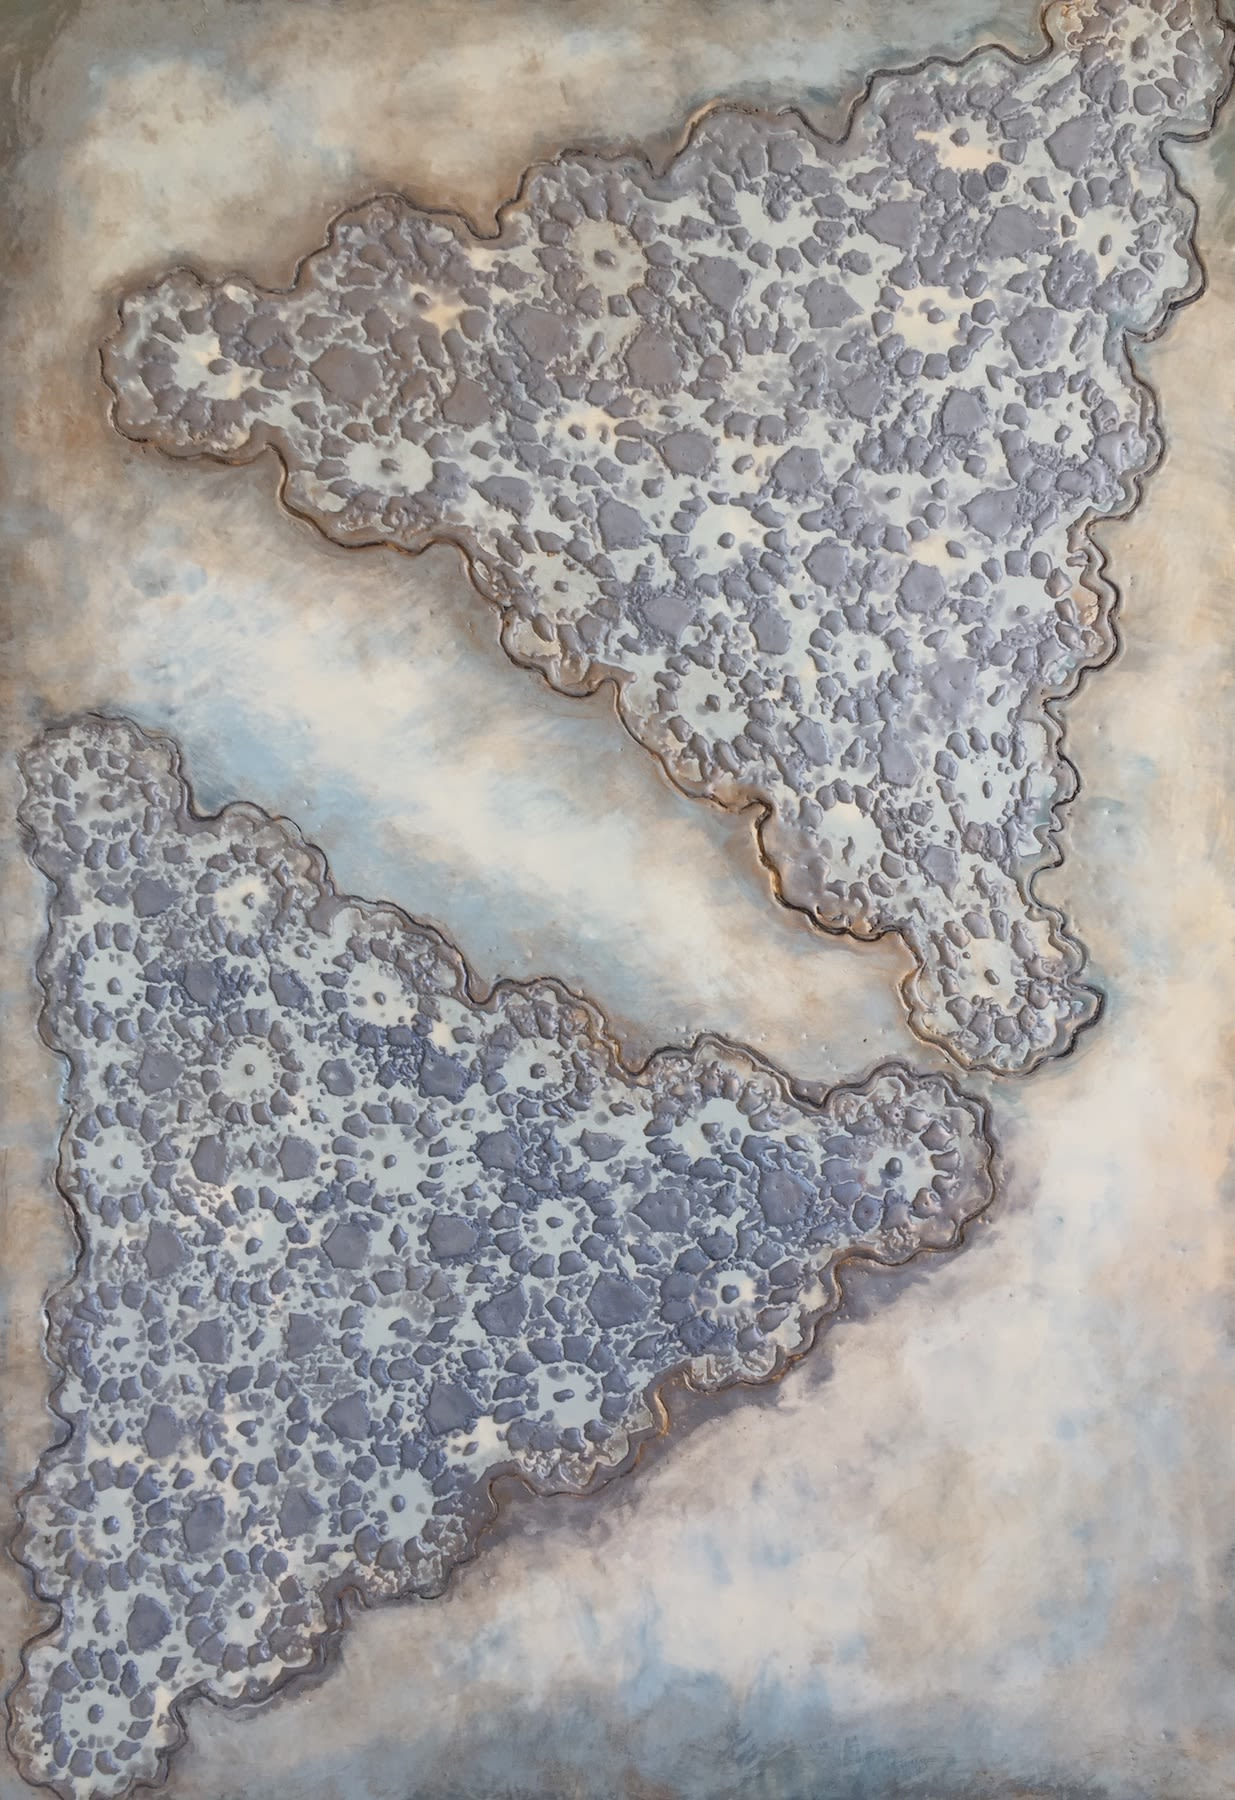 Paintings by willa vennema seen at Portland Art Gallery, Portland - Hand Work Series